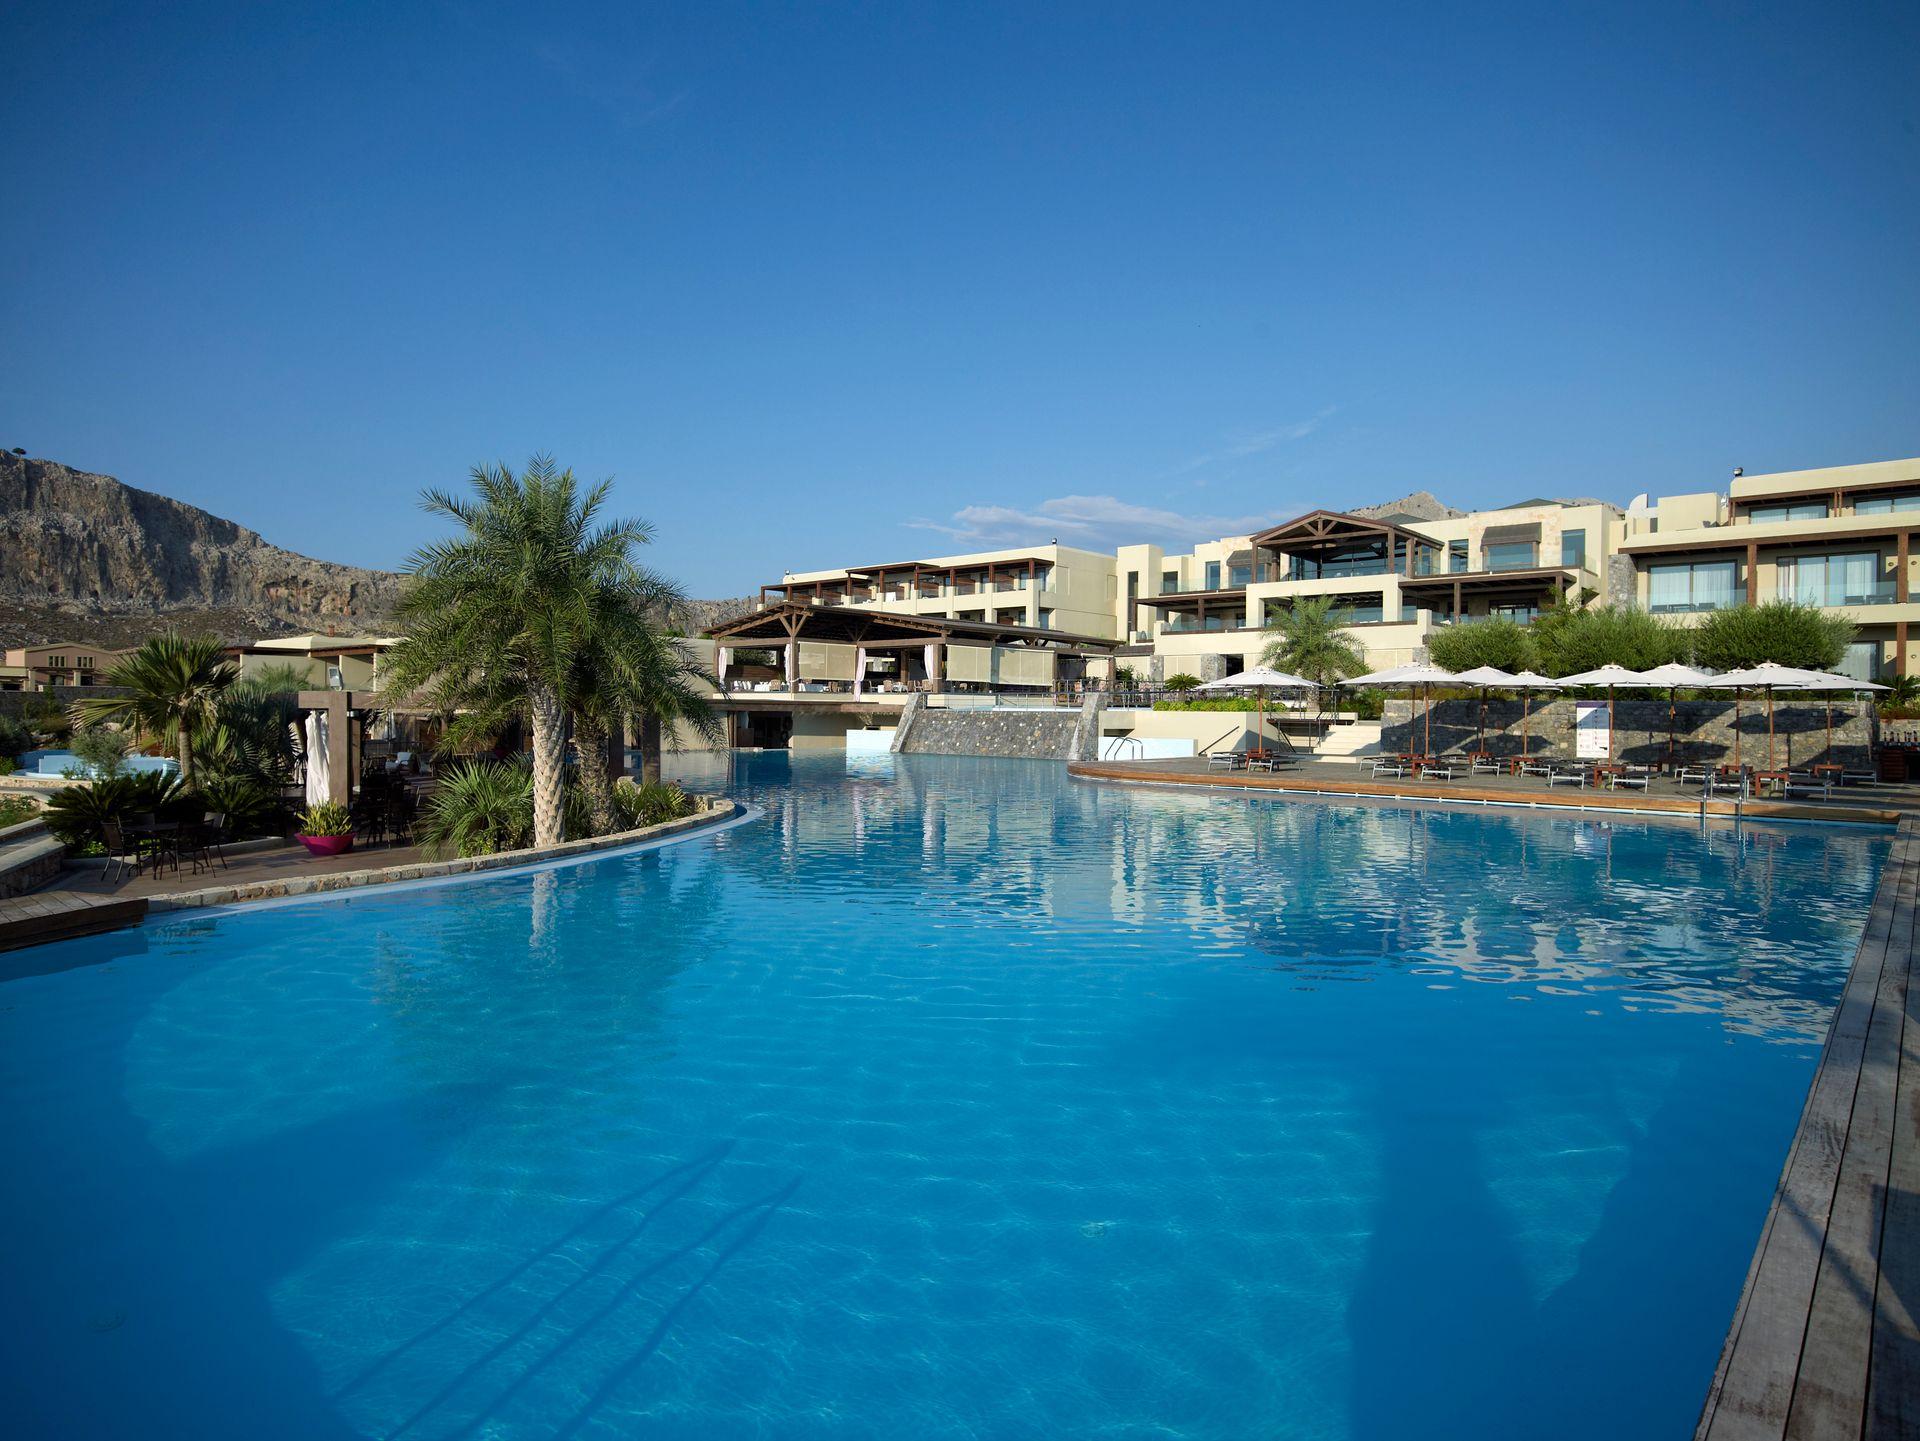 5* Aquagrand Exclusive Deluxe Resort – Λινδος, Ροδος ✦ 3 Ημερες (2 Διανυκτερευσεις) ✦ 2 Άτομα ✦ Ημιδιατροφη ✦ 01/06/2019 εως 30/06/2019 ✦ Μπροστα στην Παραλια!